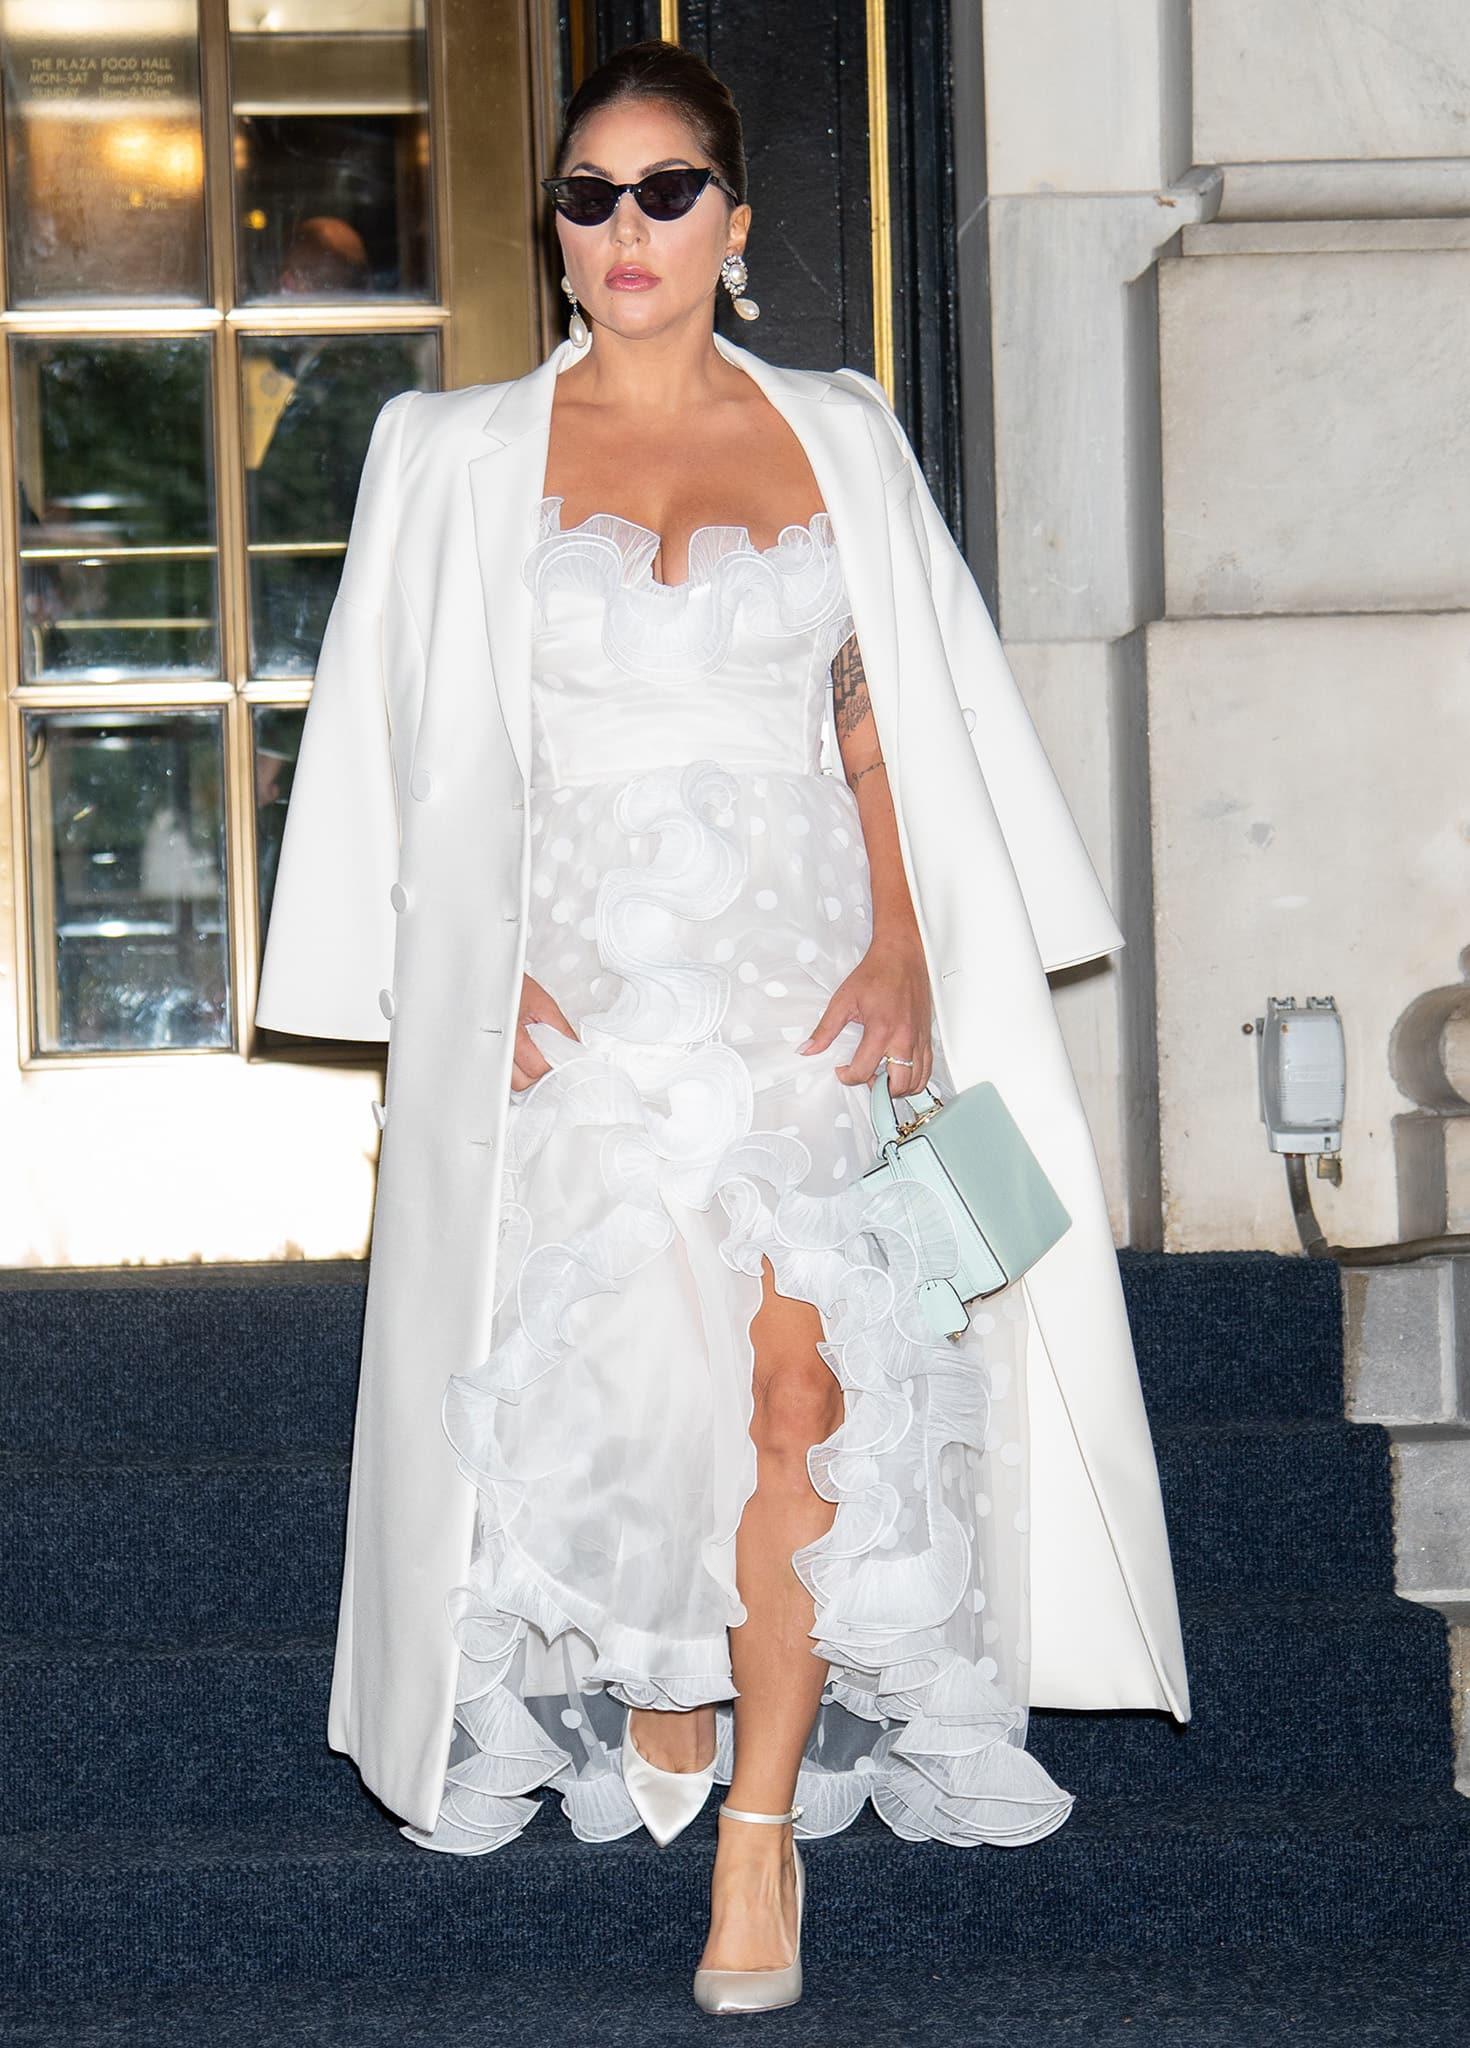 Lady Gaga pairs her Giambattista Valli white tulle ruffled dress with a Fendi wool-blend coat